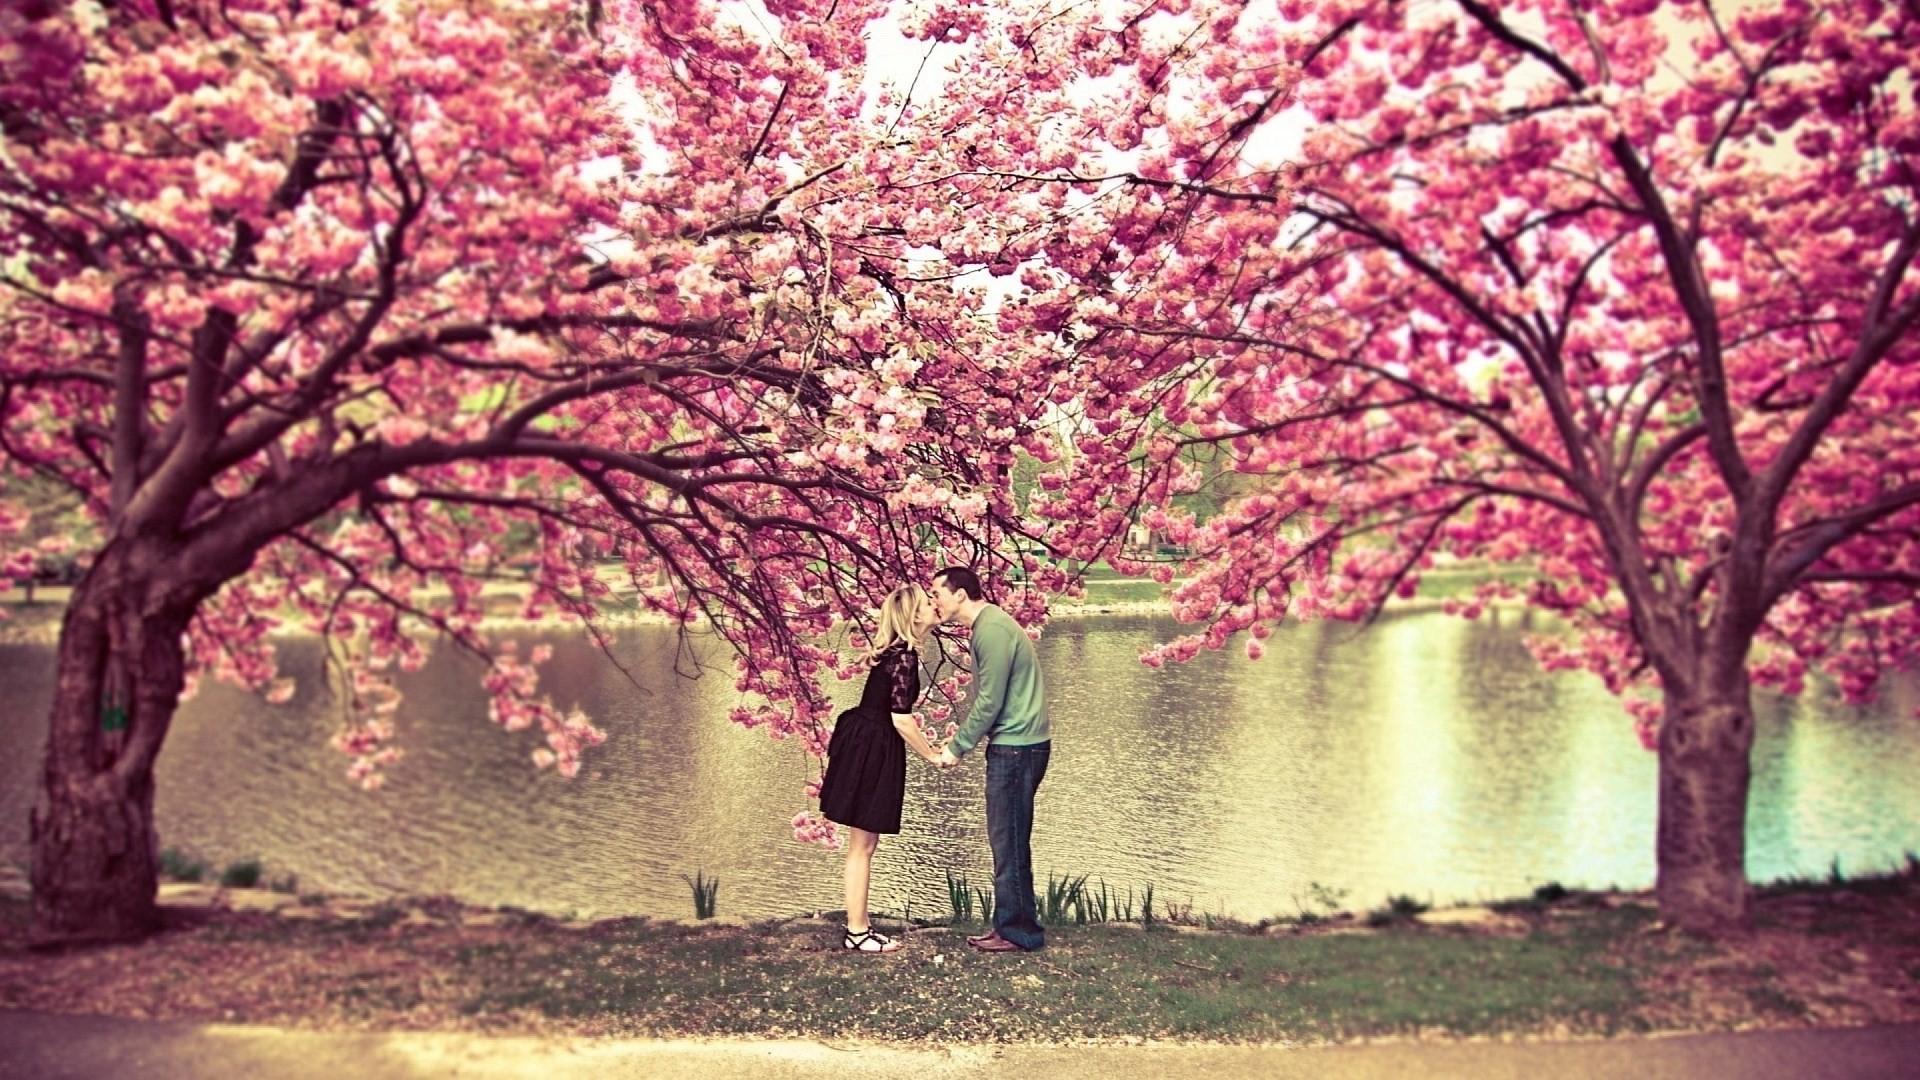 cherry blossom background. Black Bedroom Furniture Sets. Home Design Ideas